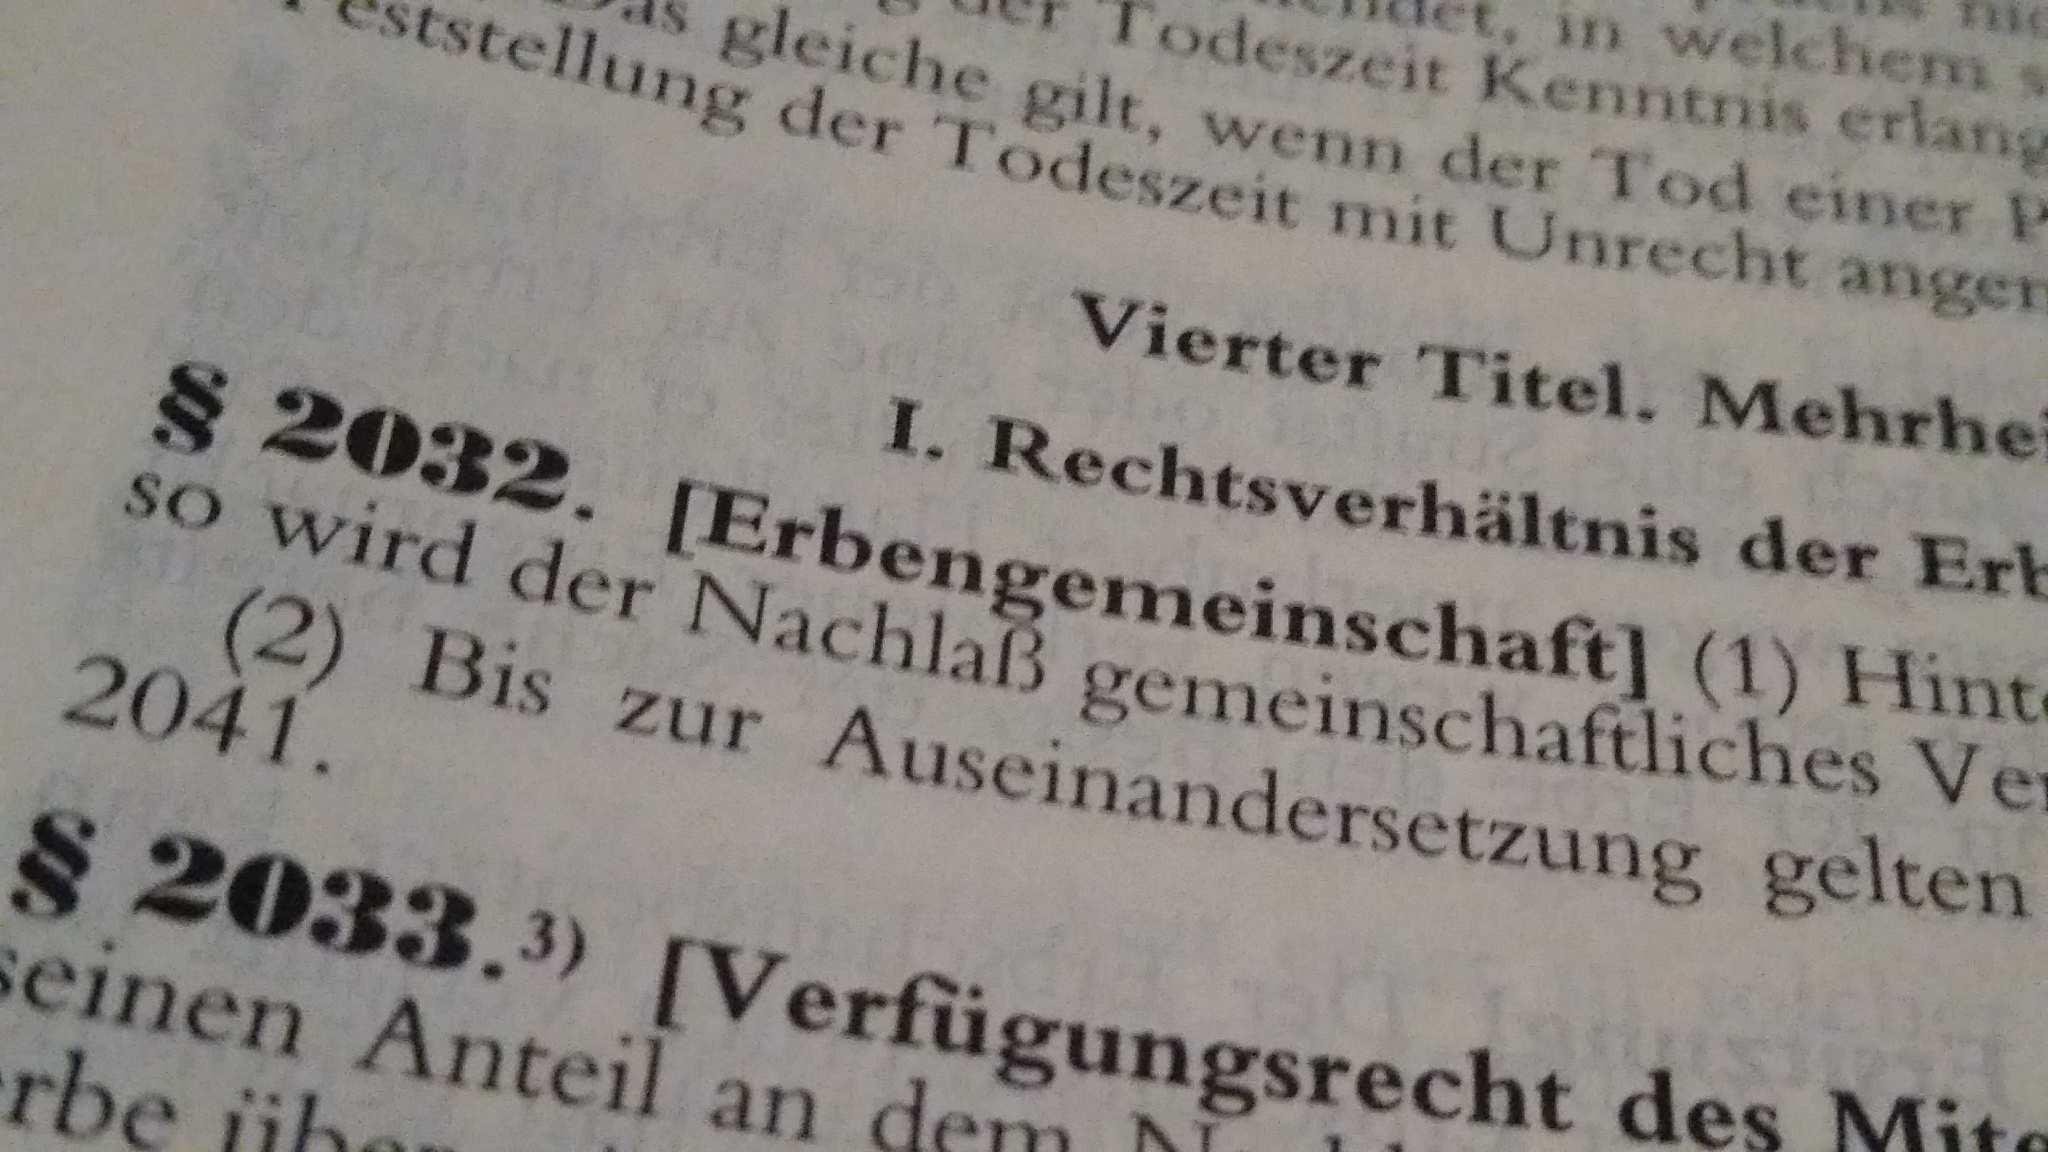 Erbengemeinschaft Das Sollten Erben Wissen Burgerratgeber